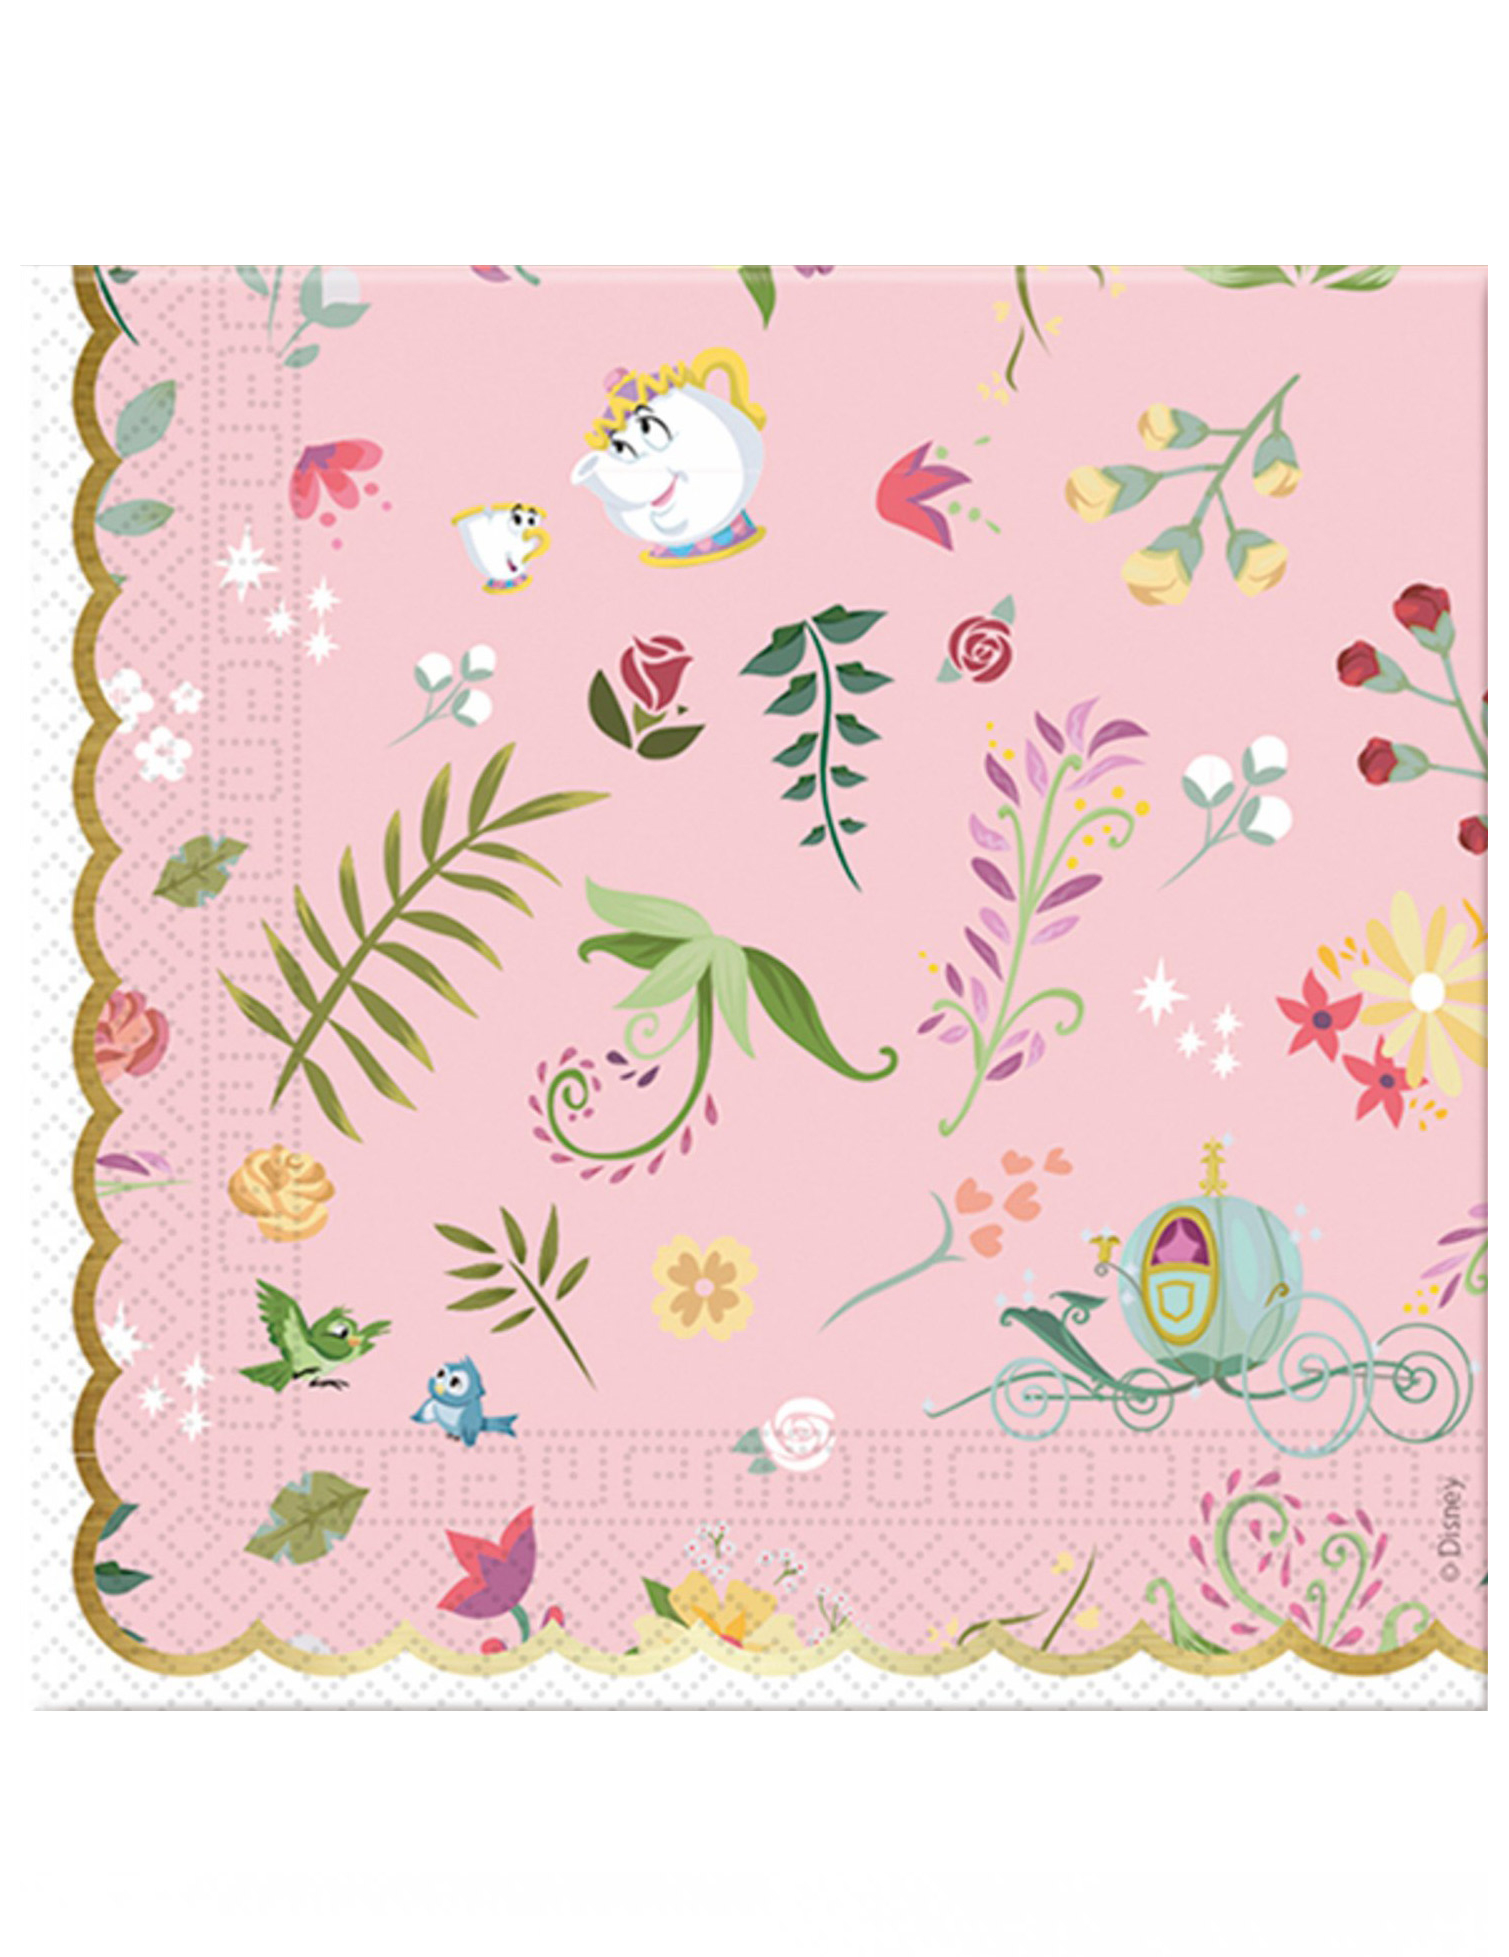 #Disney™-Prinzessinnen Papierservietten 20 Stück bunt 33x33cm#